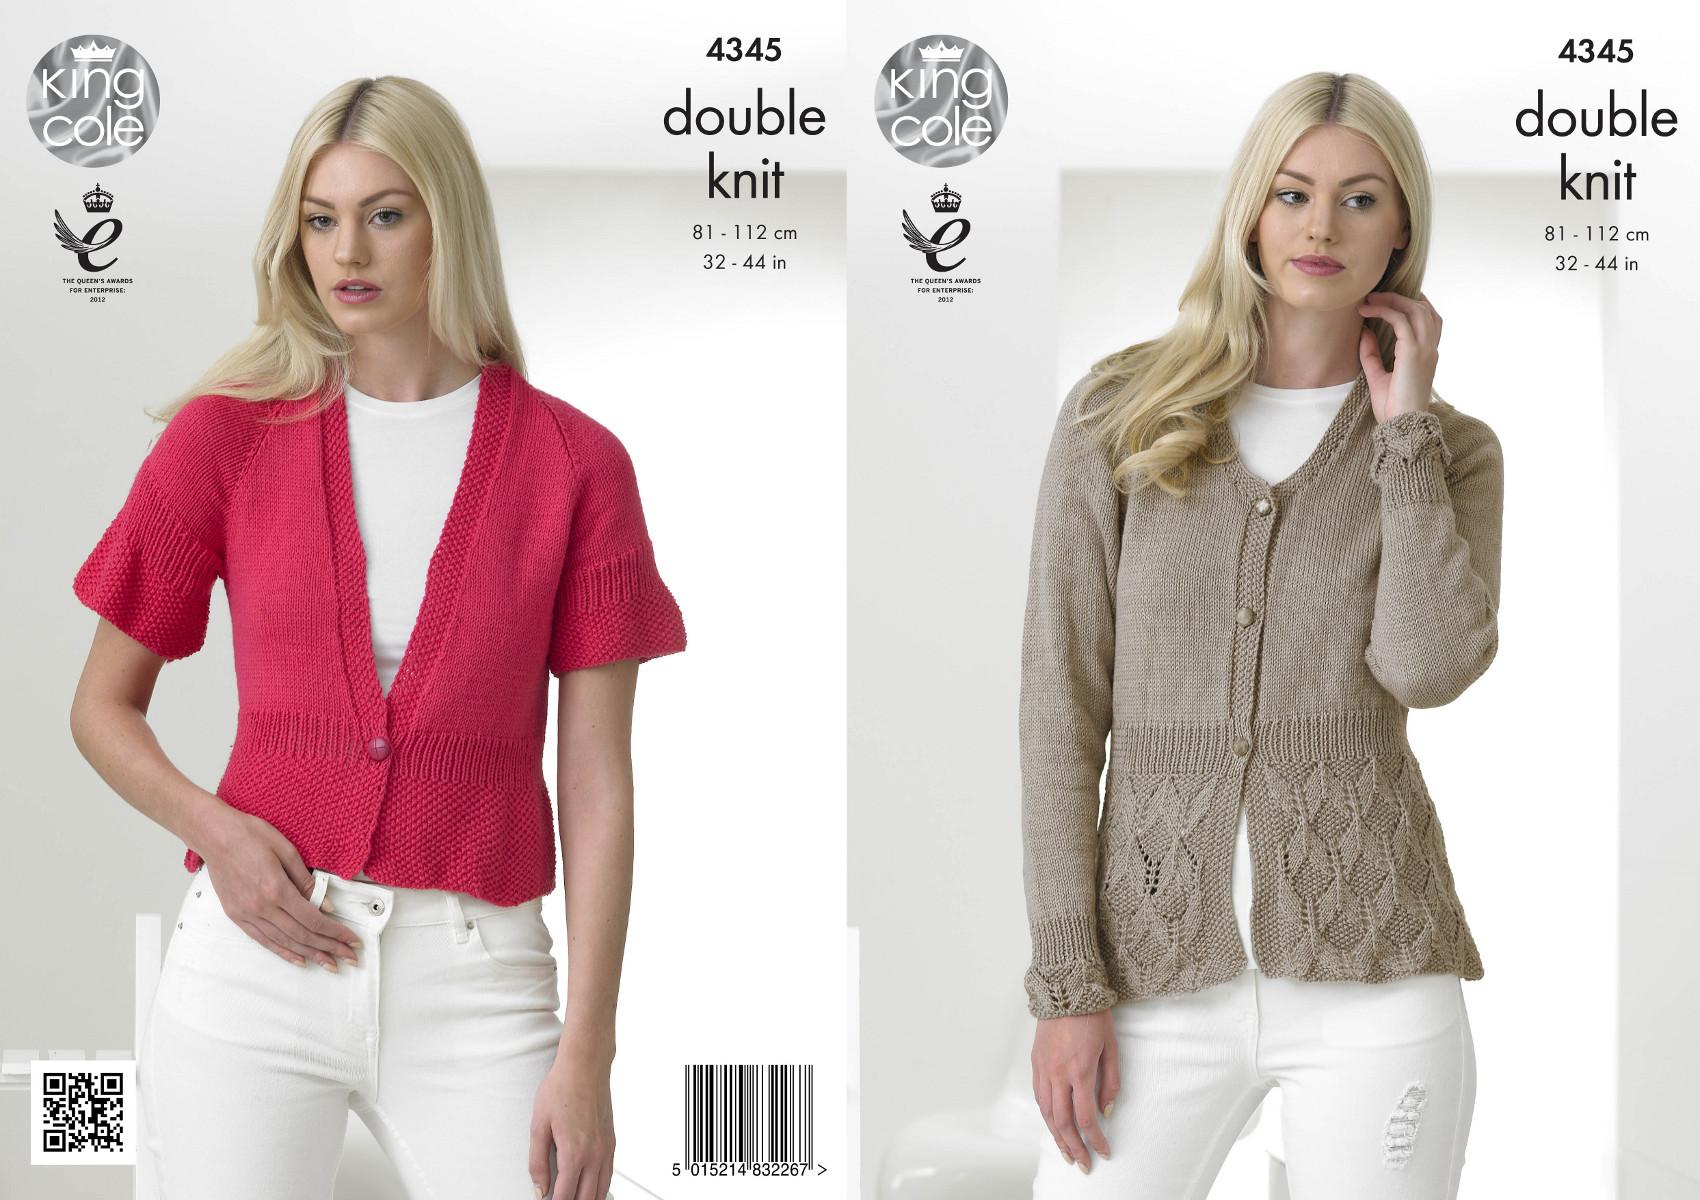 Womens Long Short Sleeve Cardigans Knitting Pattern King Cole ...